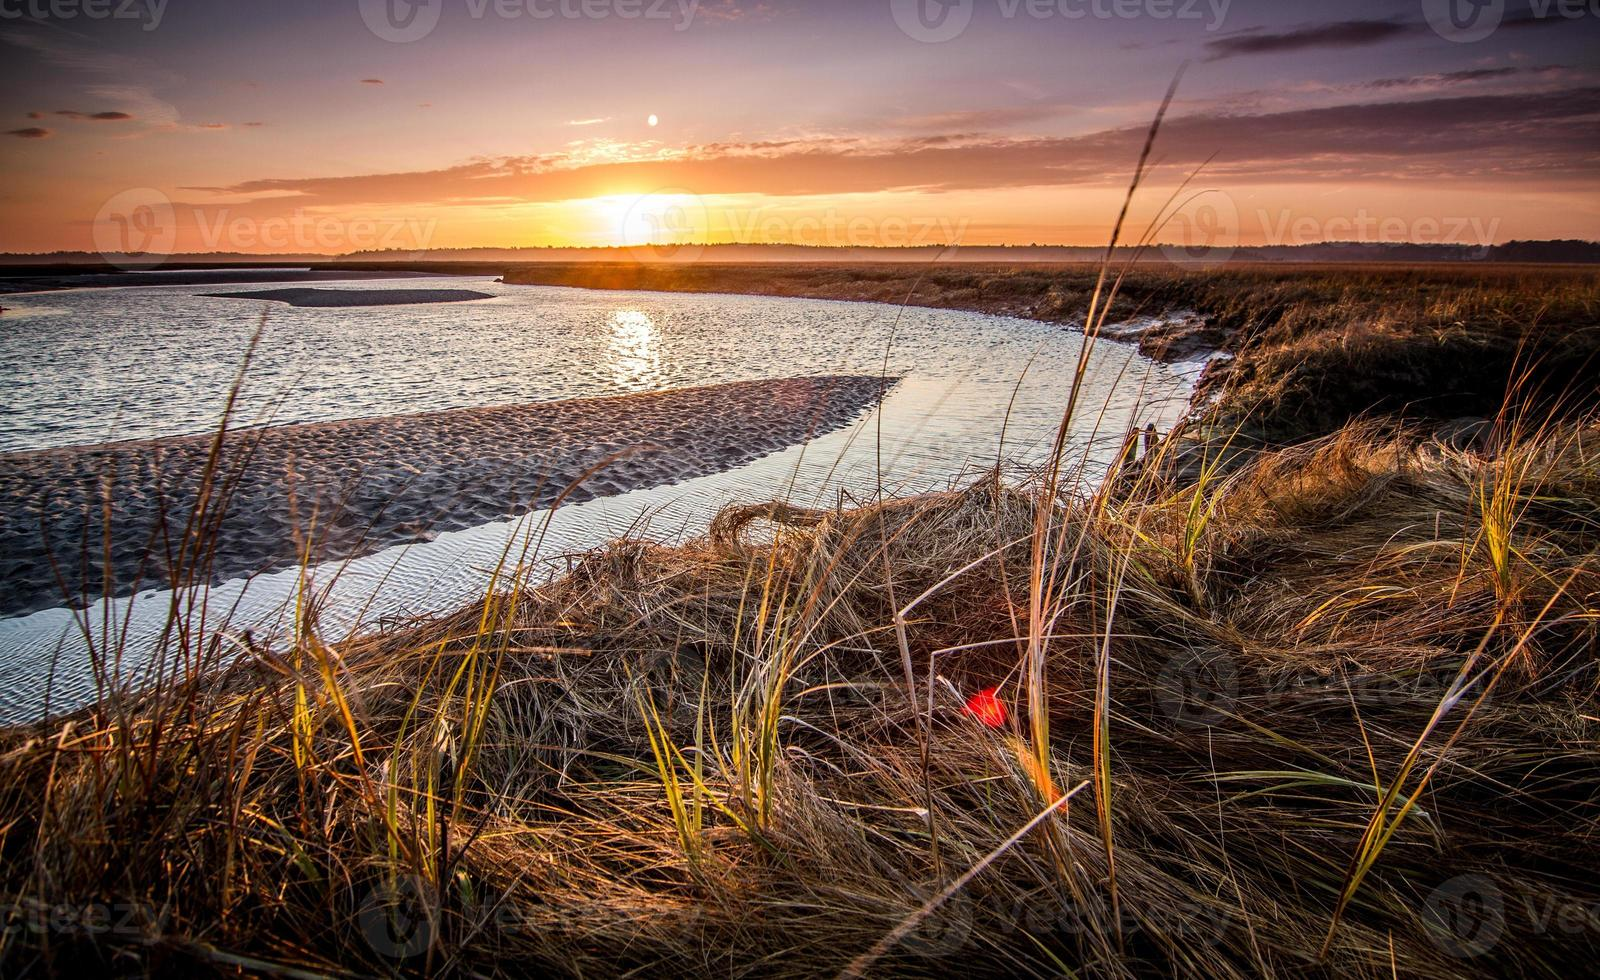 tramonto sopra la palude foto